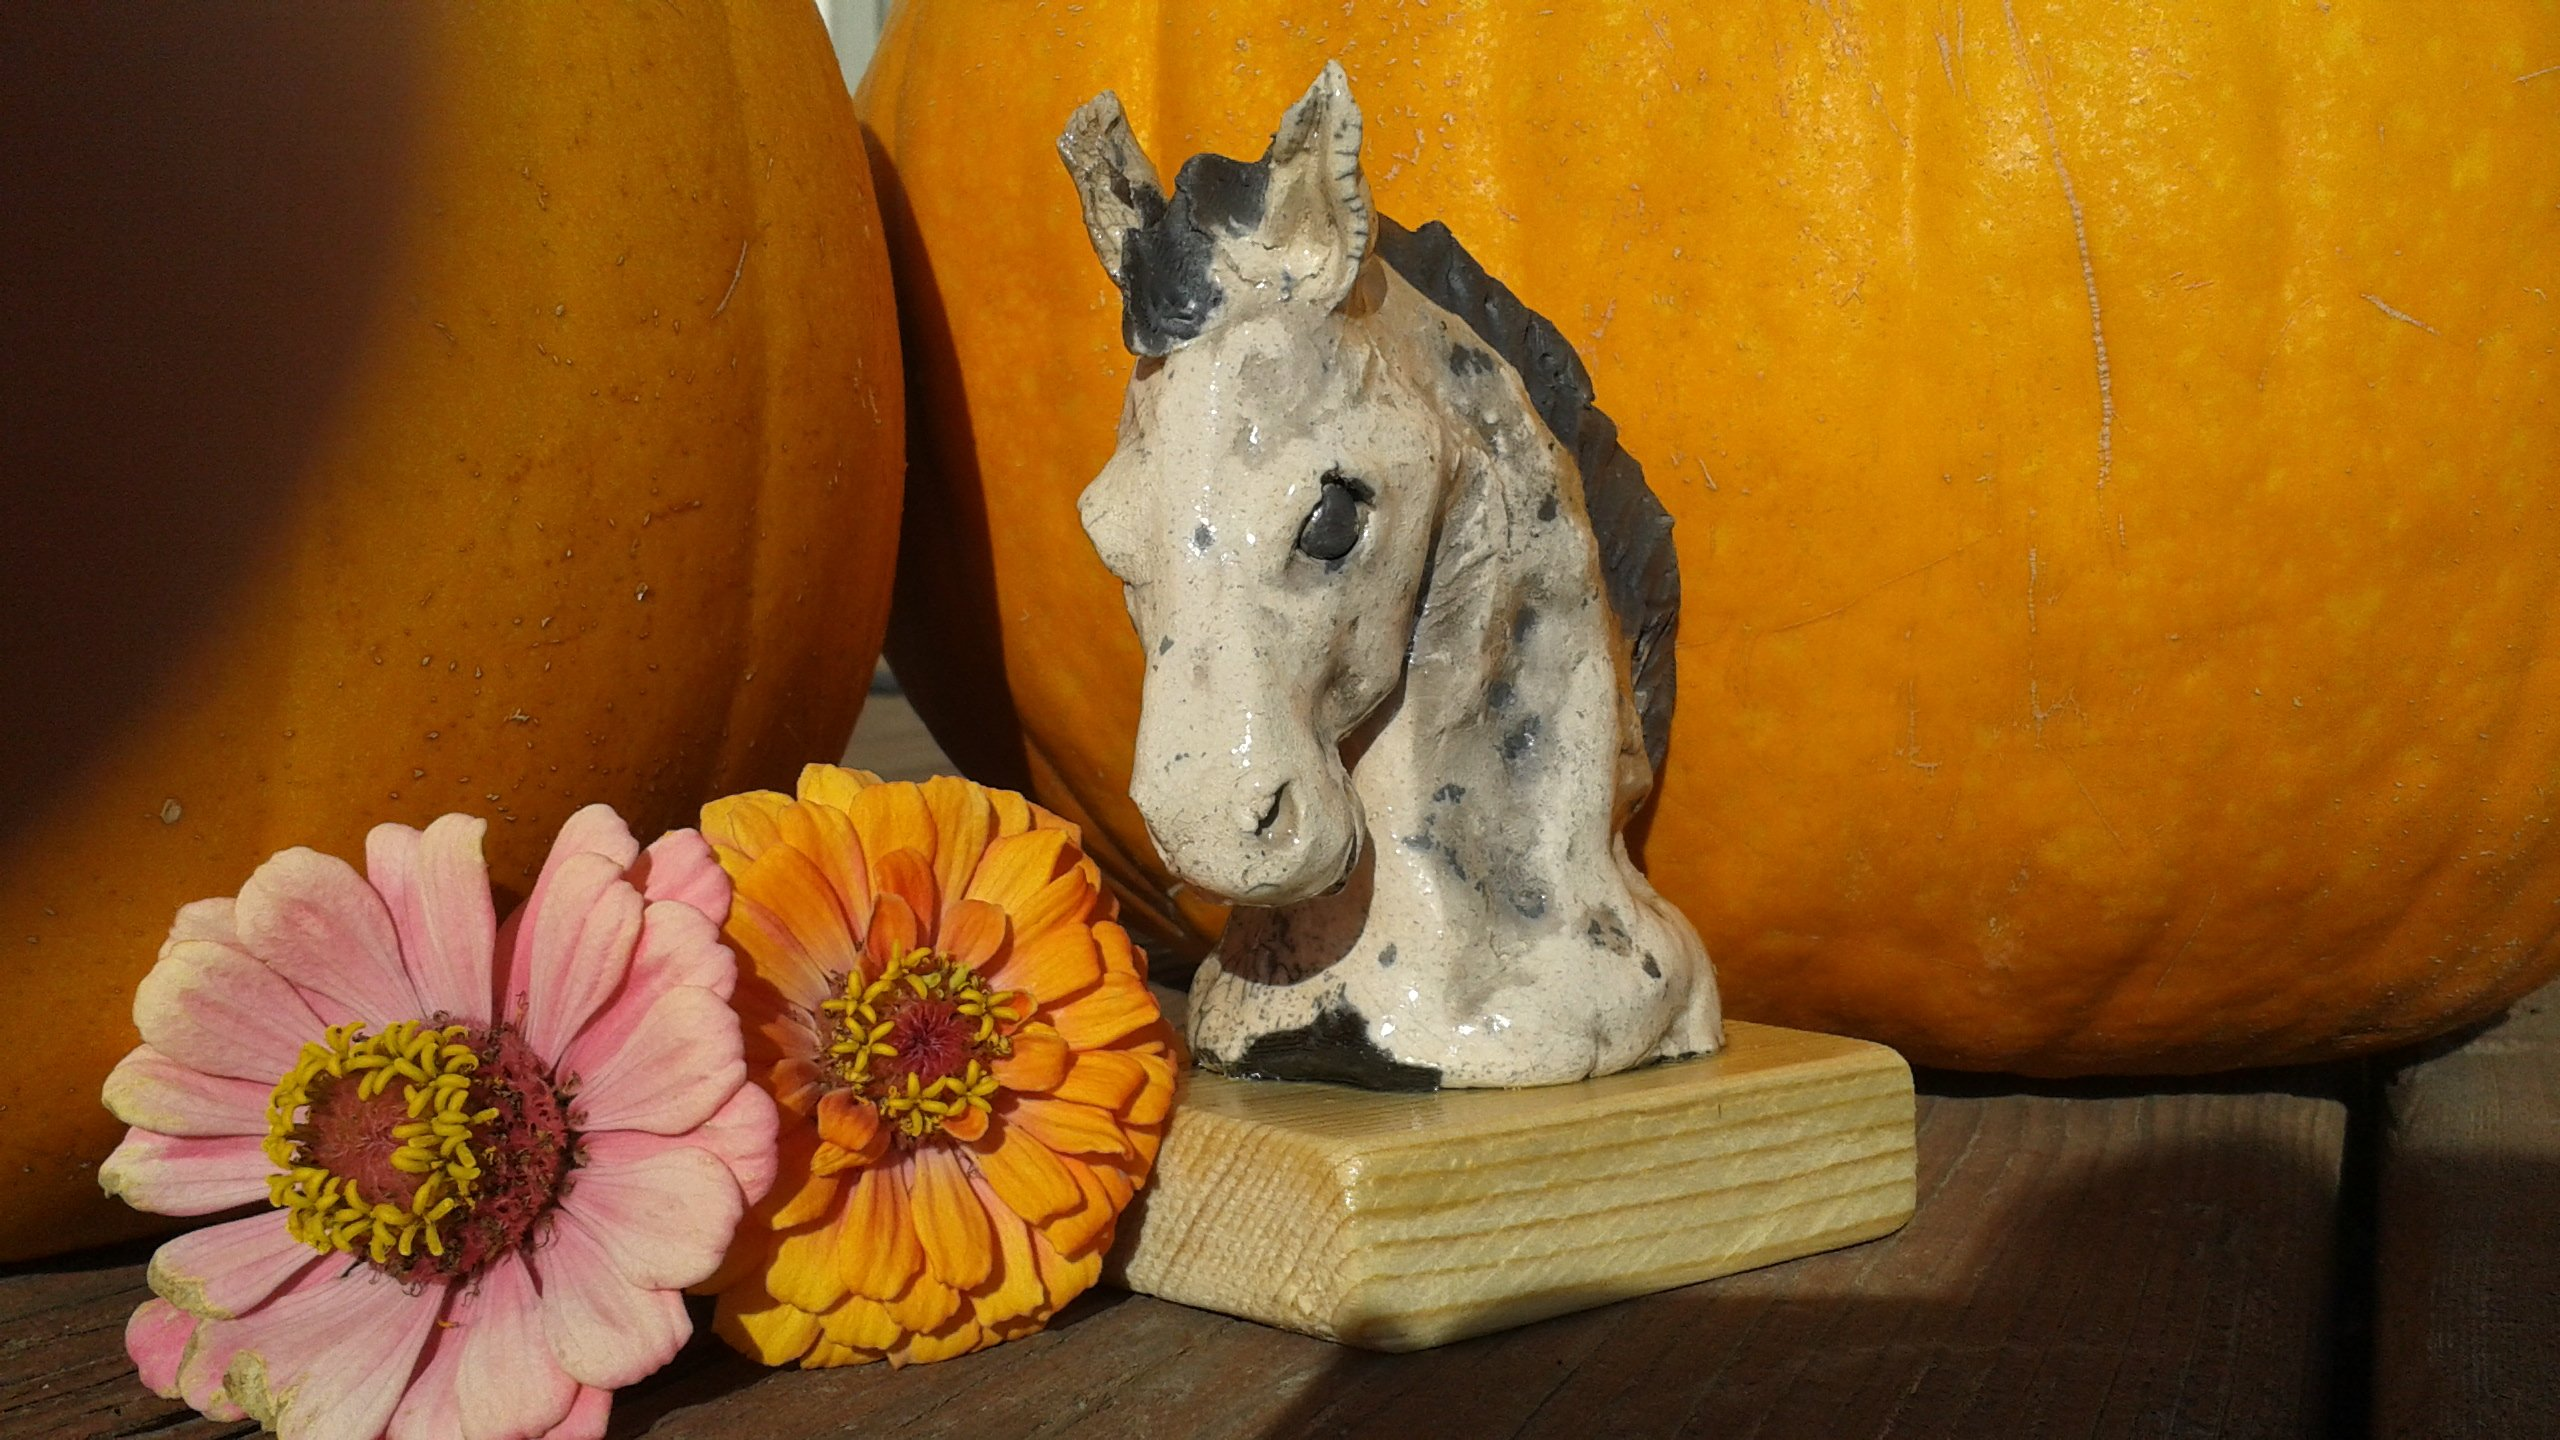 Horse and livestock clay sculpture-bucephalus.jpg